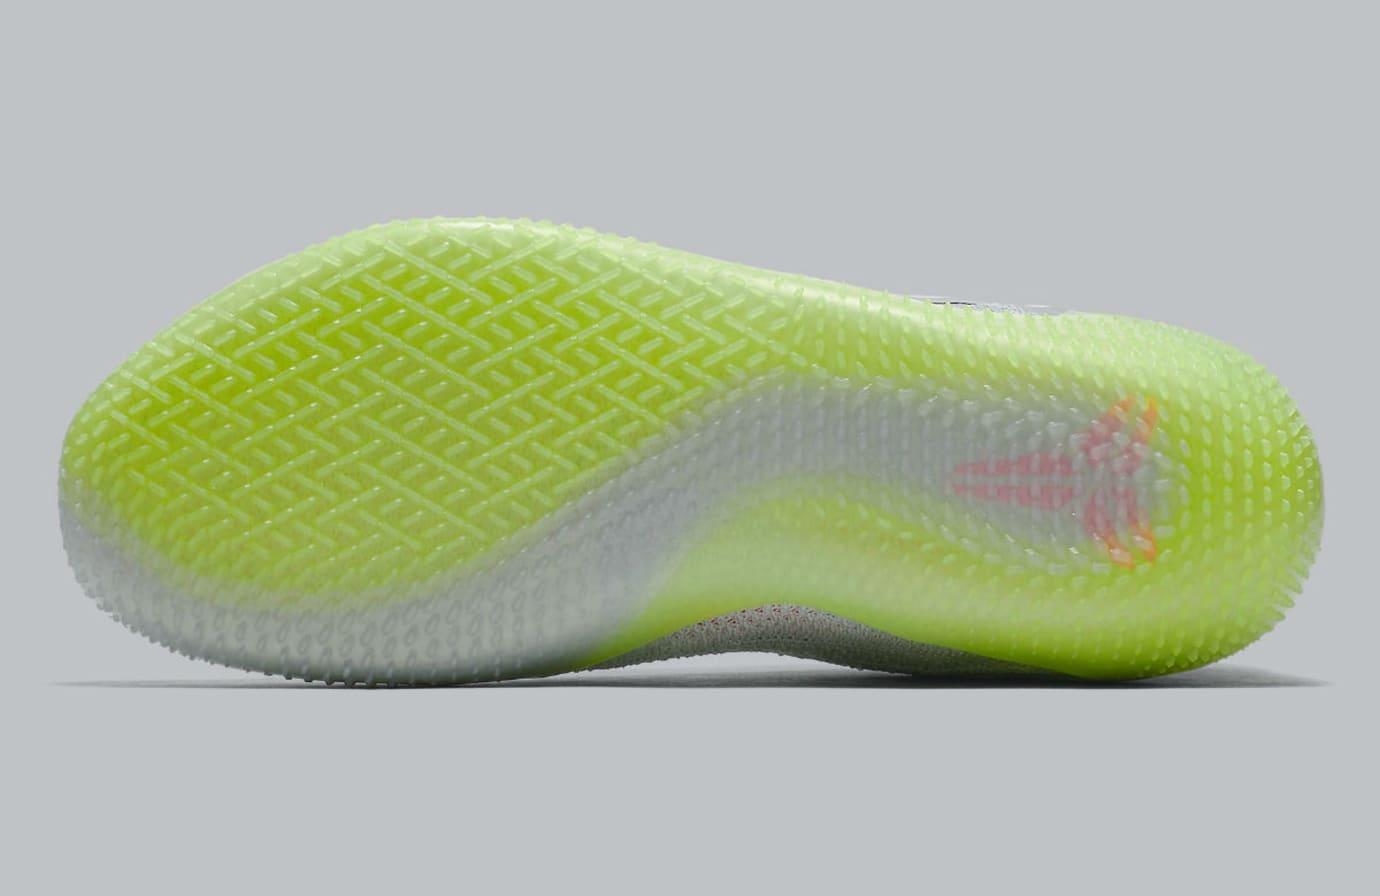 f839722c9544ad Image via Nike Nike Kobe A.D. NXT 360 Grey Multicolor Release Date AQ1087- 003 Sole